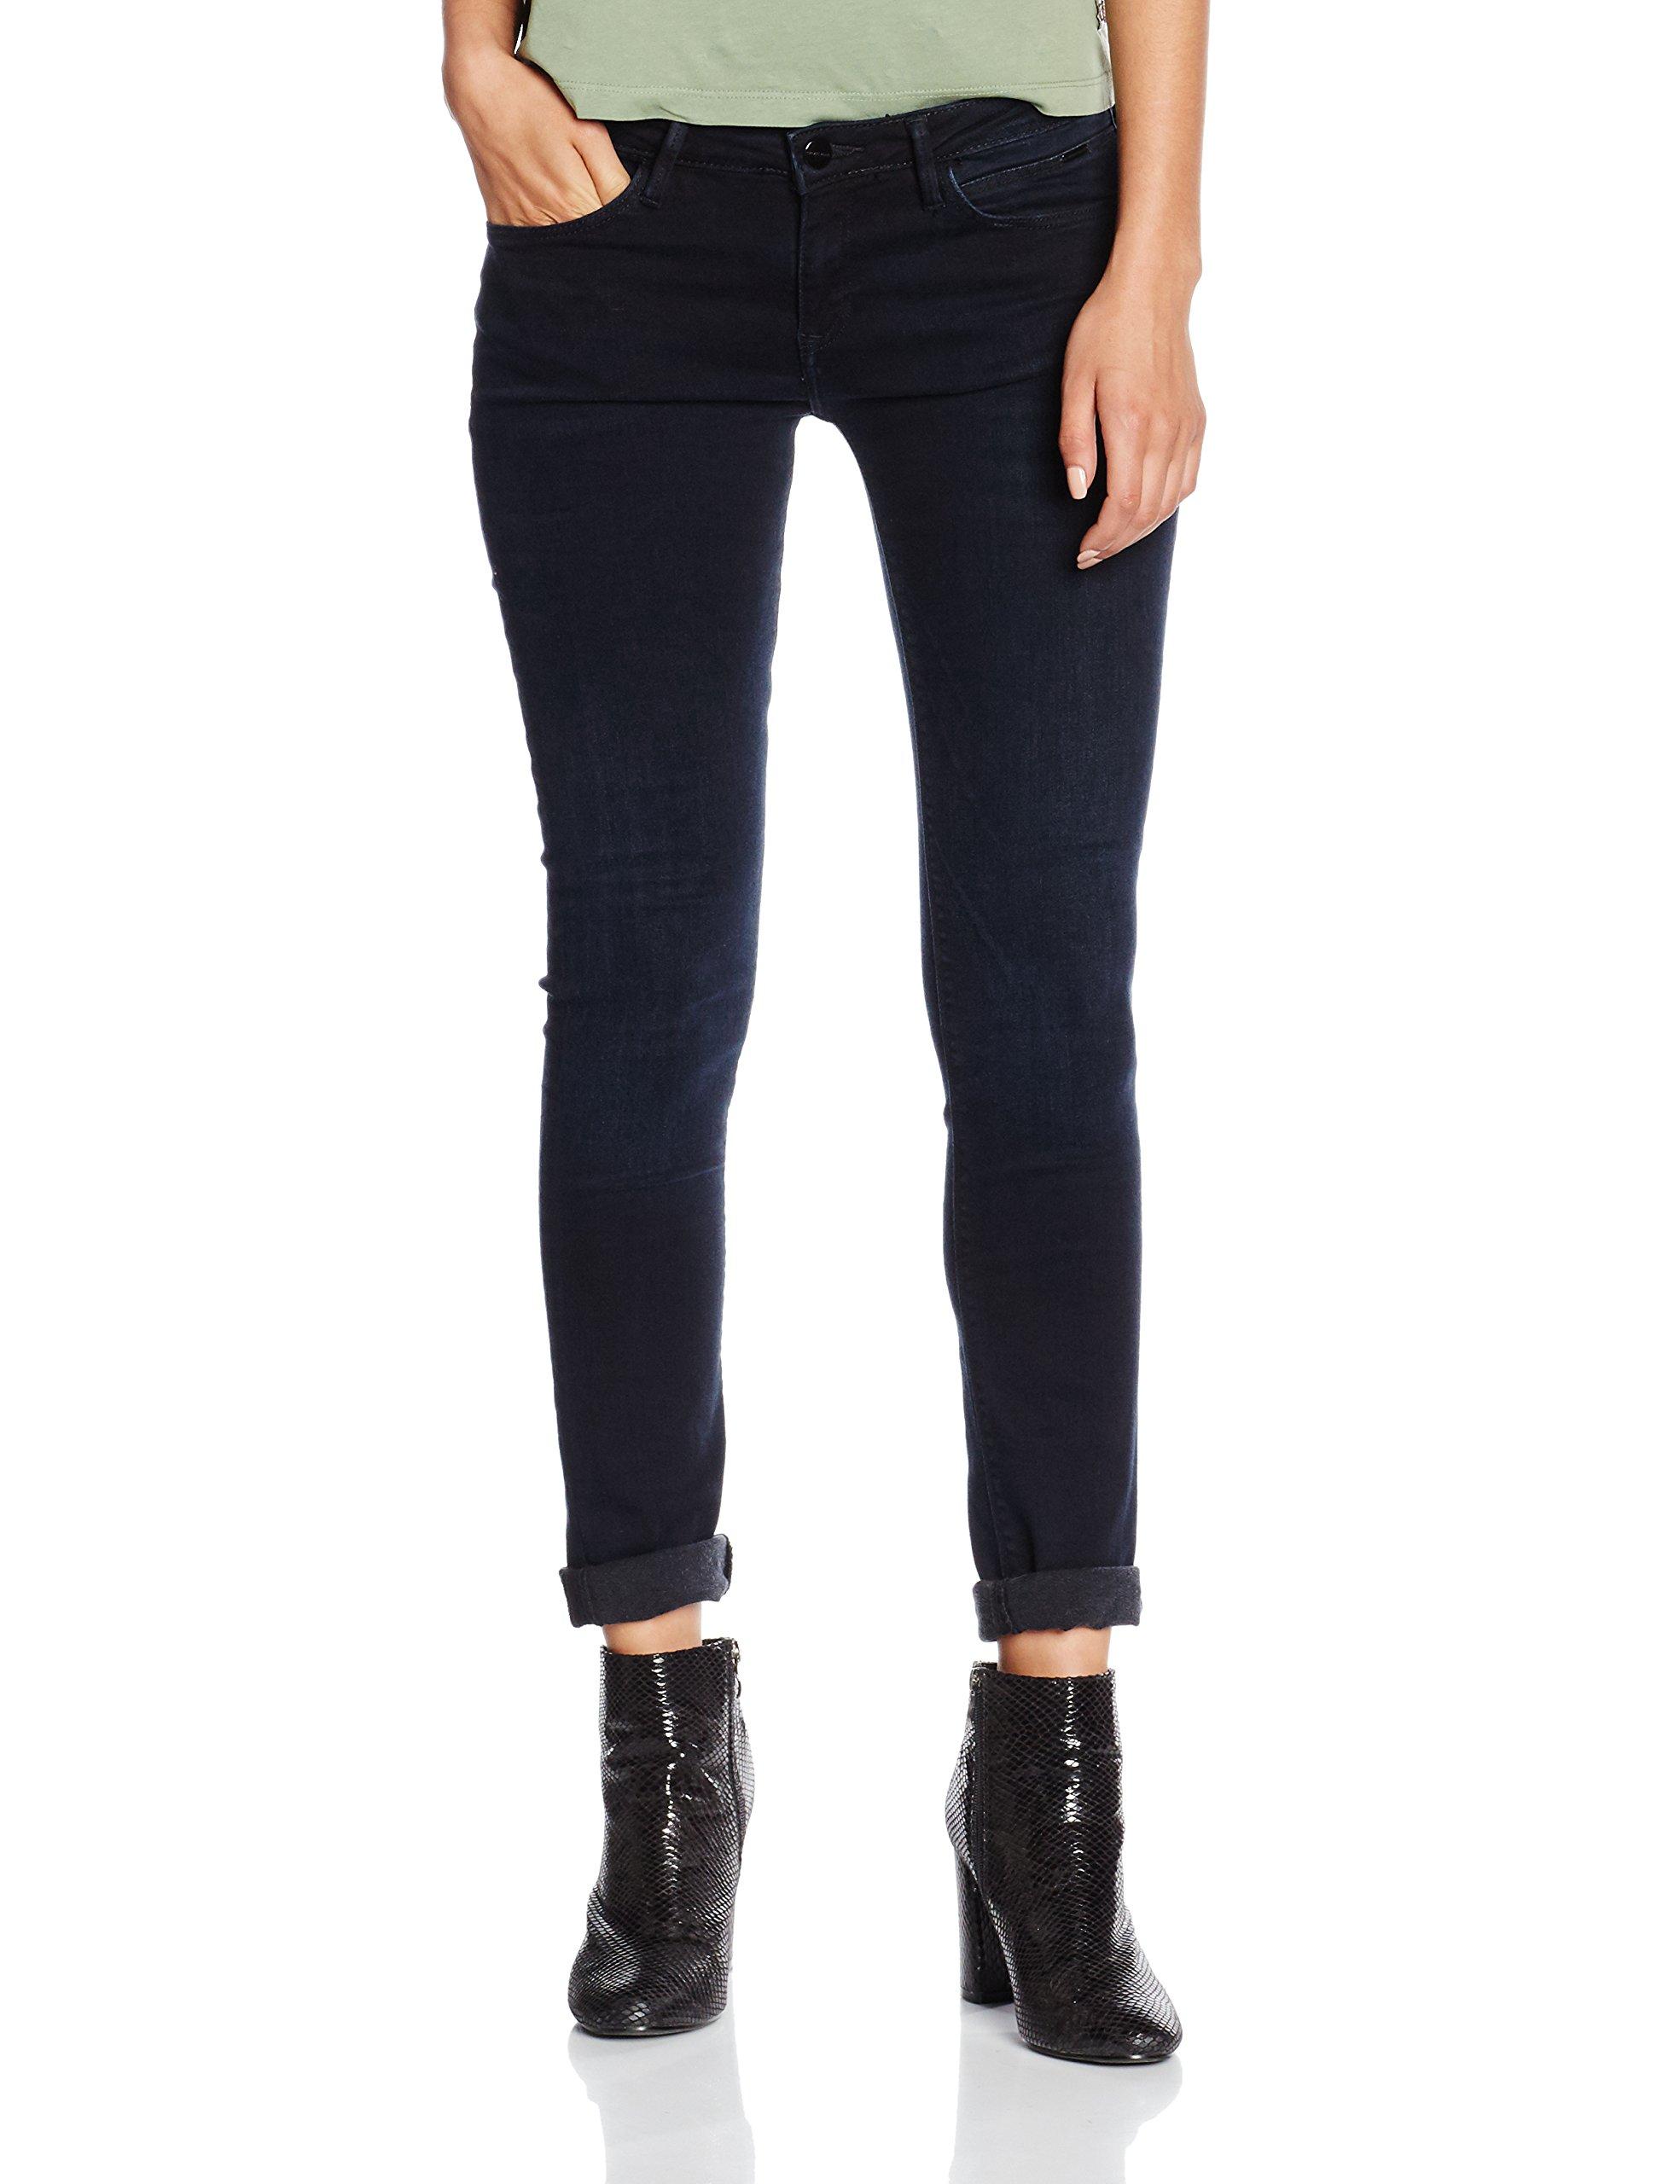 l35 Femme Cross BlackW30 JeansBleublue Adriana K5T3ul1FJc